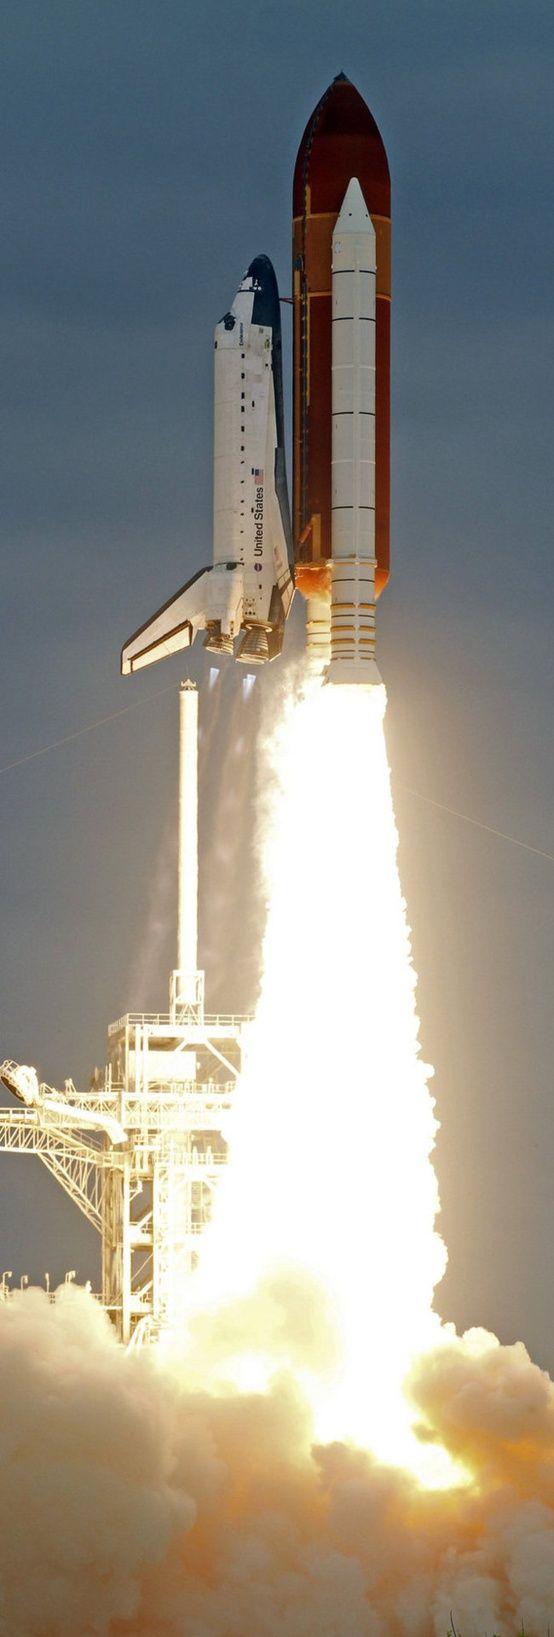 space shuttle rocket start - photo #31